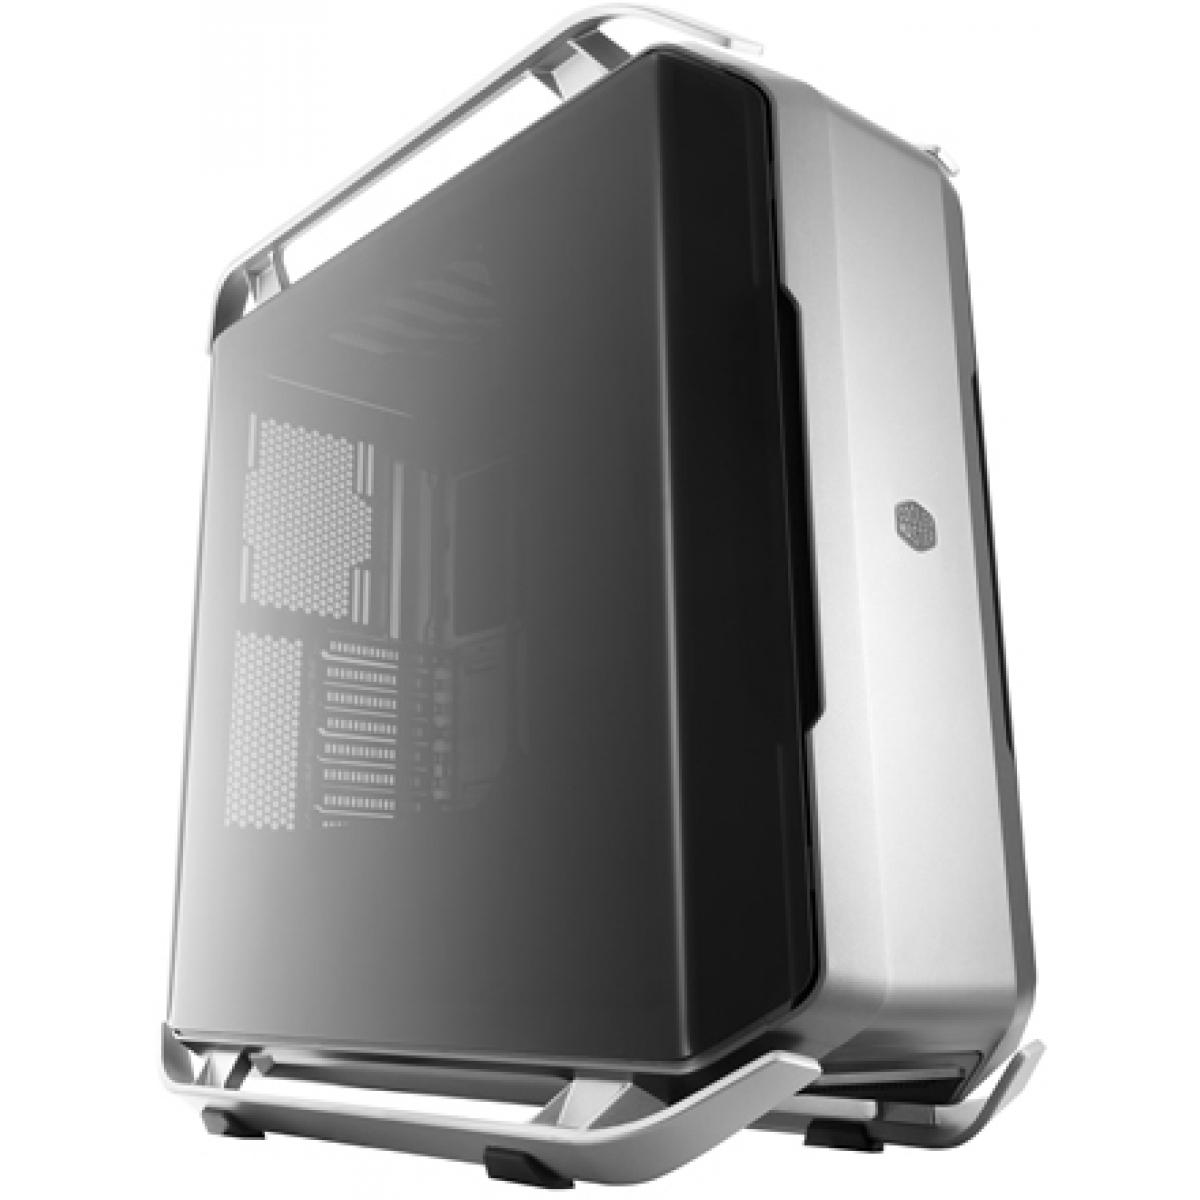 Gabinete Gamer Cooler Master Cosmos C700P RGB, Full Tower, Com 3 Fans, Vidro Temperado, Black, Sem Fonte, MCC-C700P-MG5N